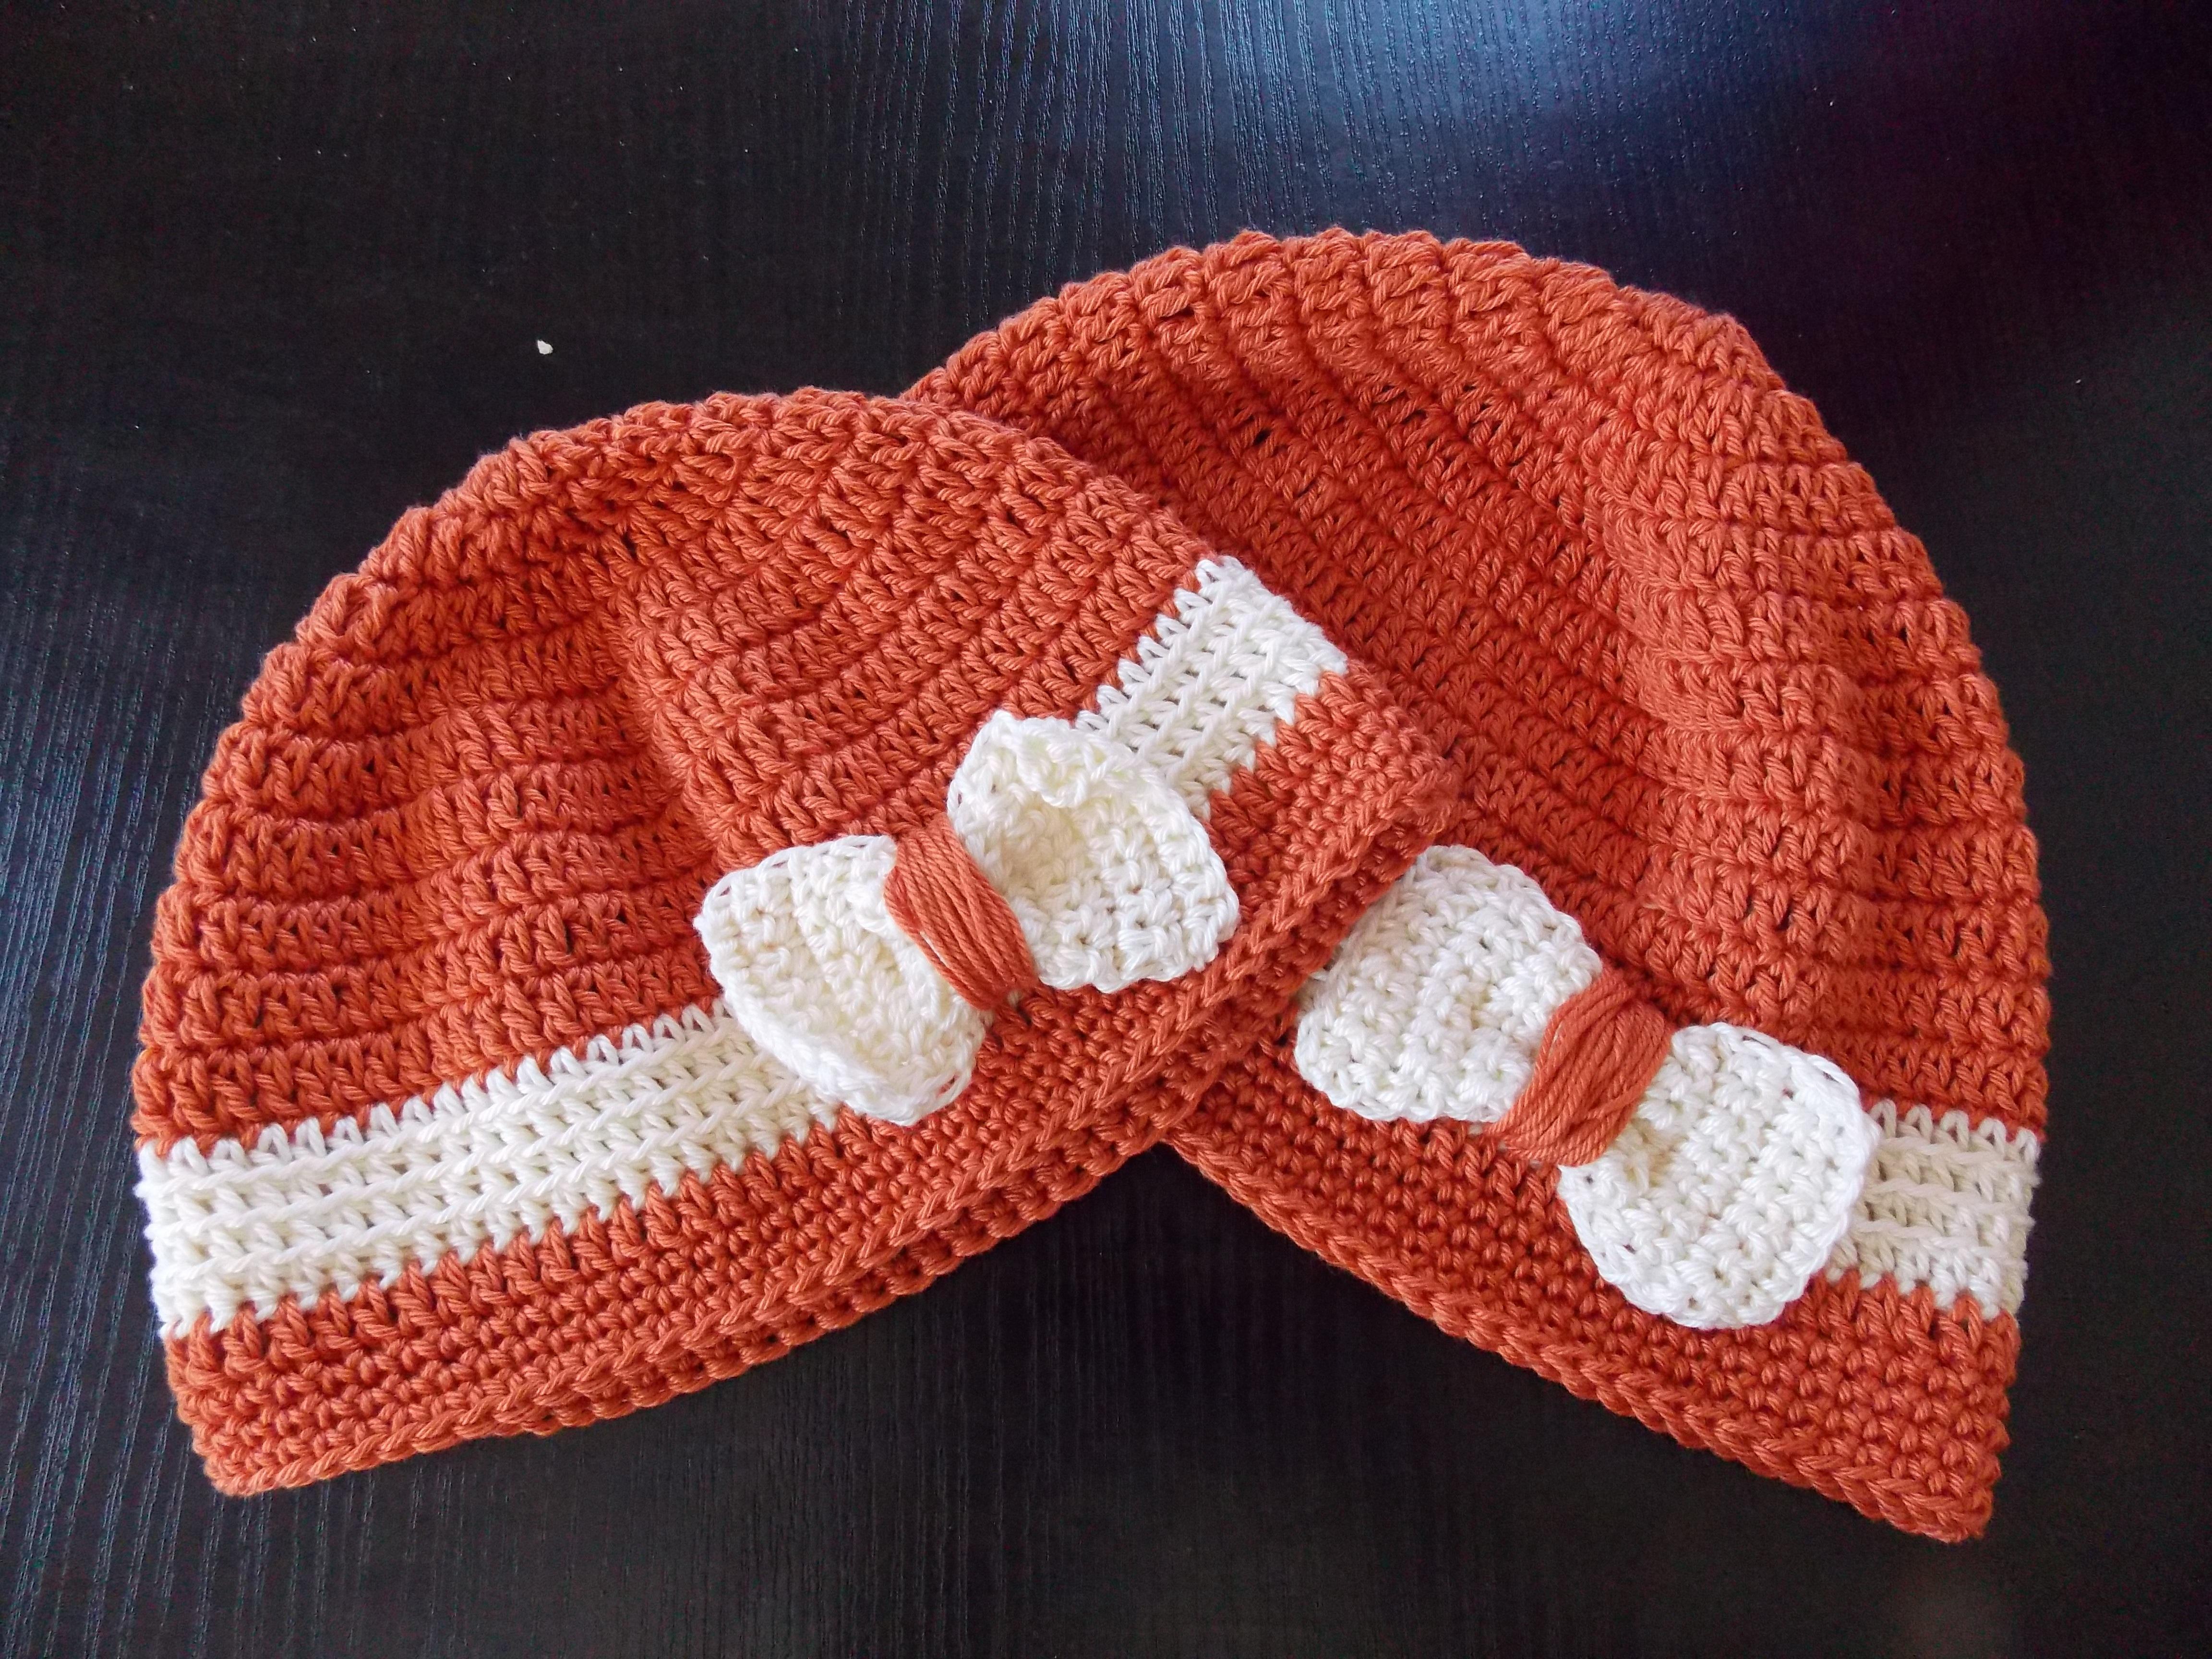 Fotos gratis : invierno, niña, patrón, rojo, sombrero, ropa, Casco ...